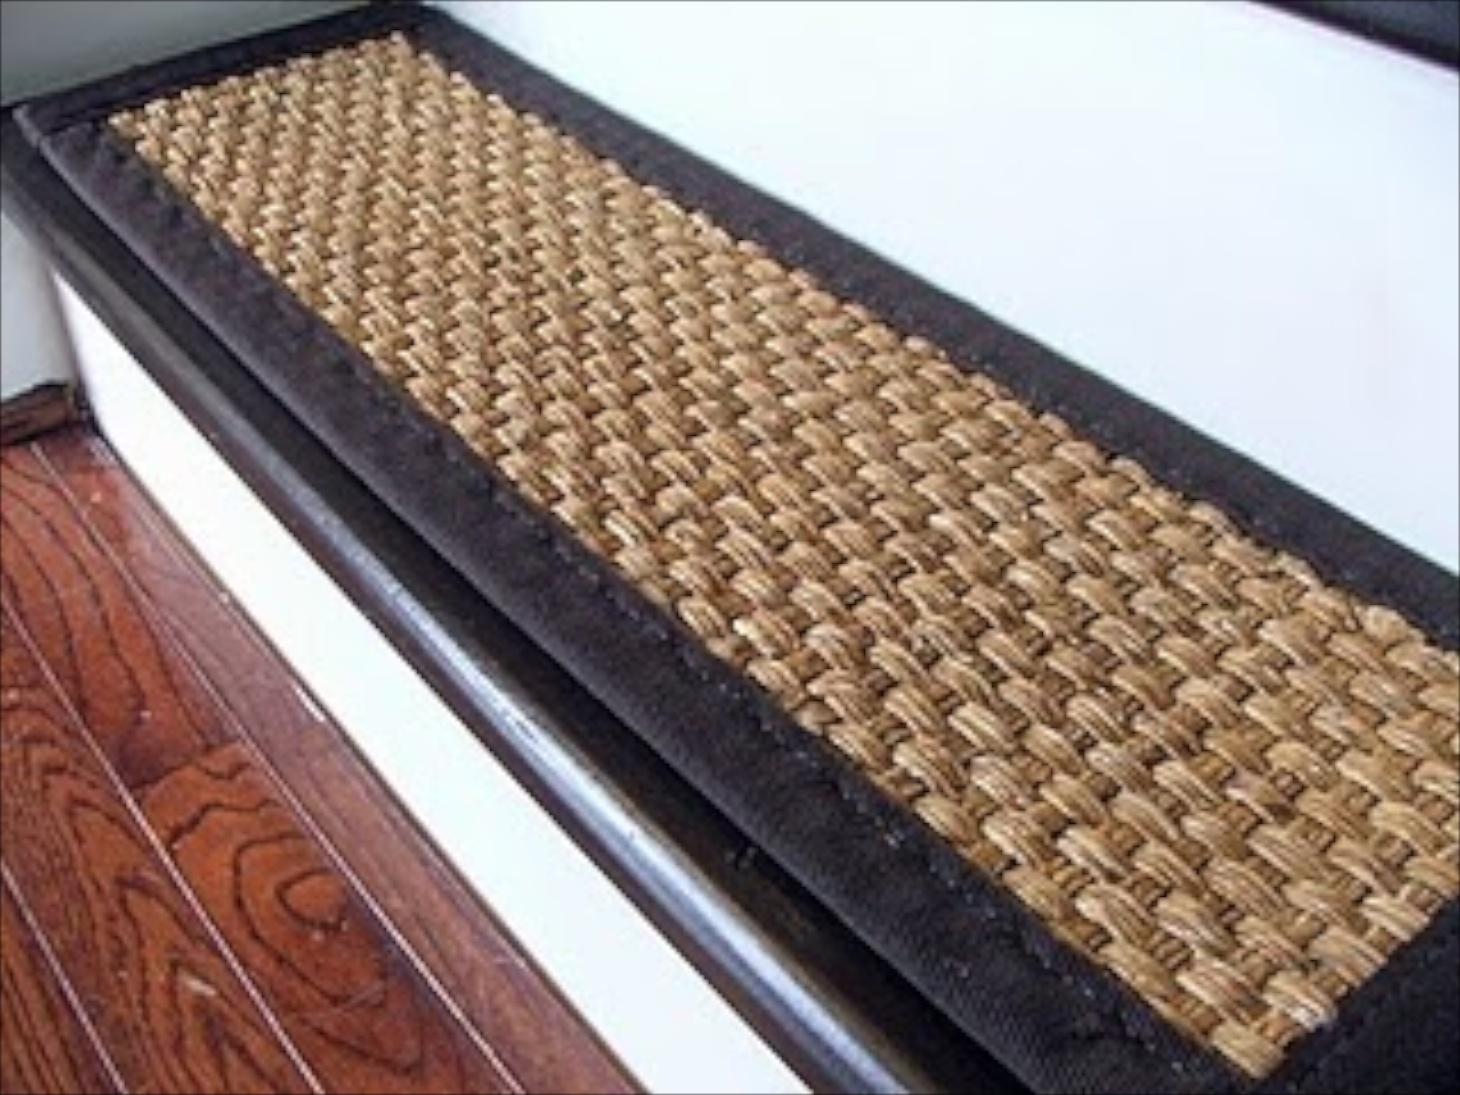 Flooring Carpeting Stair Treads Stair Treads Carpet Carpet Pertaining To Carpet Stair Treads And Rugs (#8 of 20)